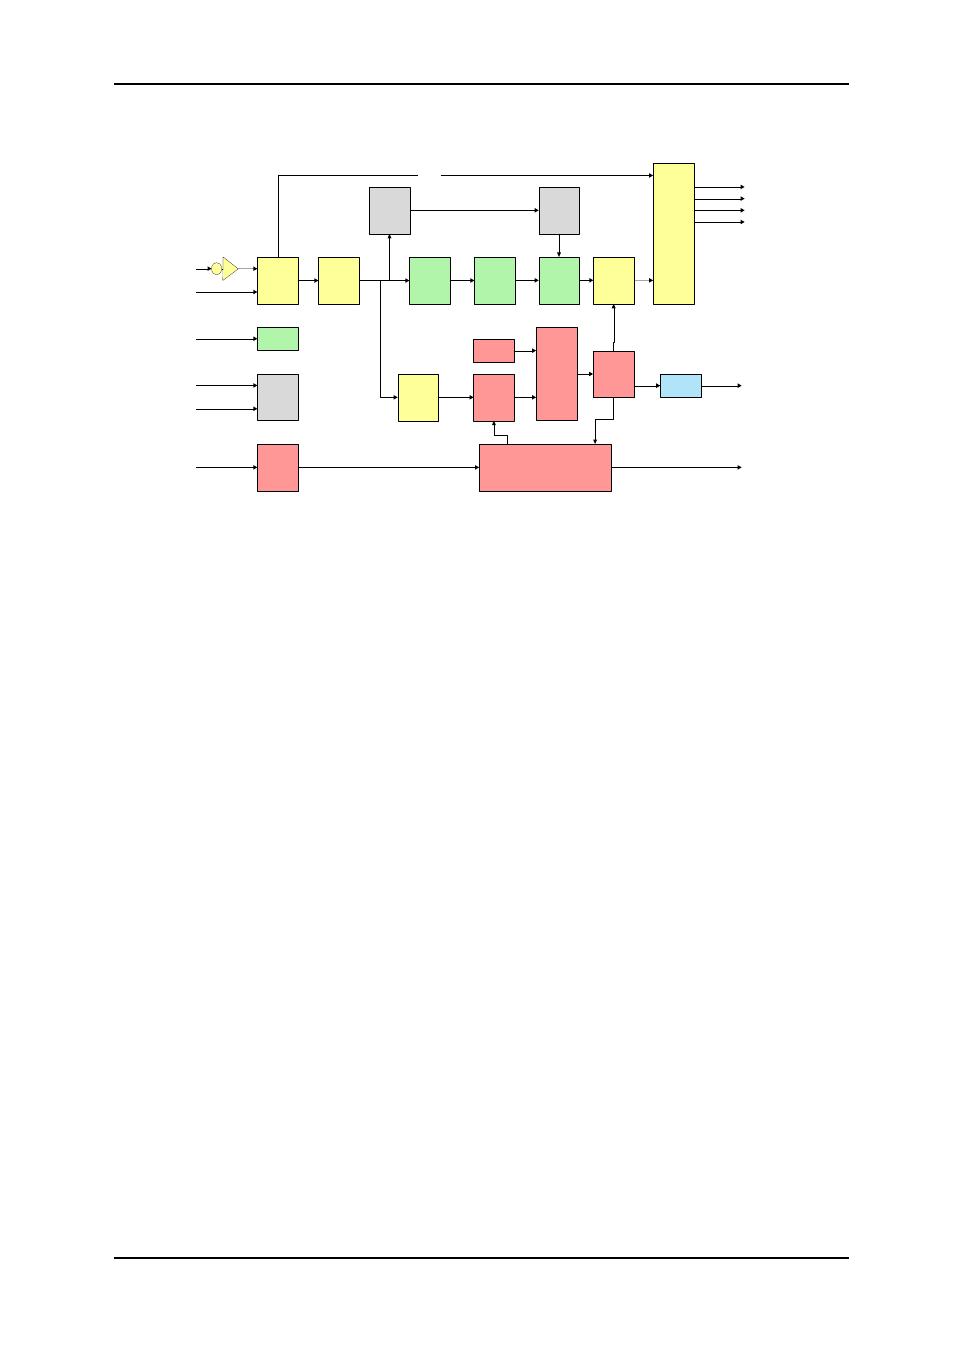 hight resolution of rockchip rk3066 table reference design block diagram 1 20block diagram 3g 20